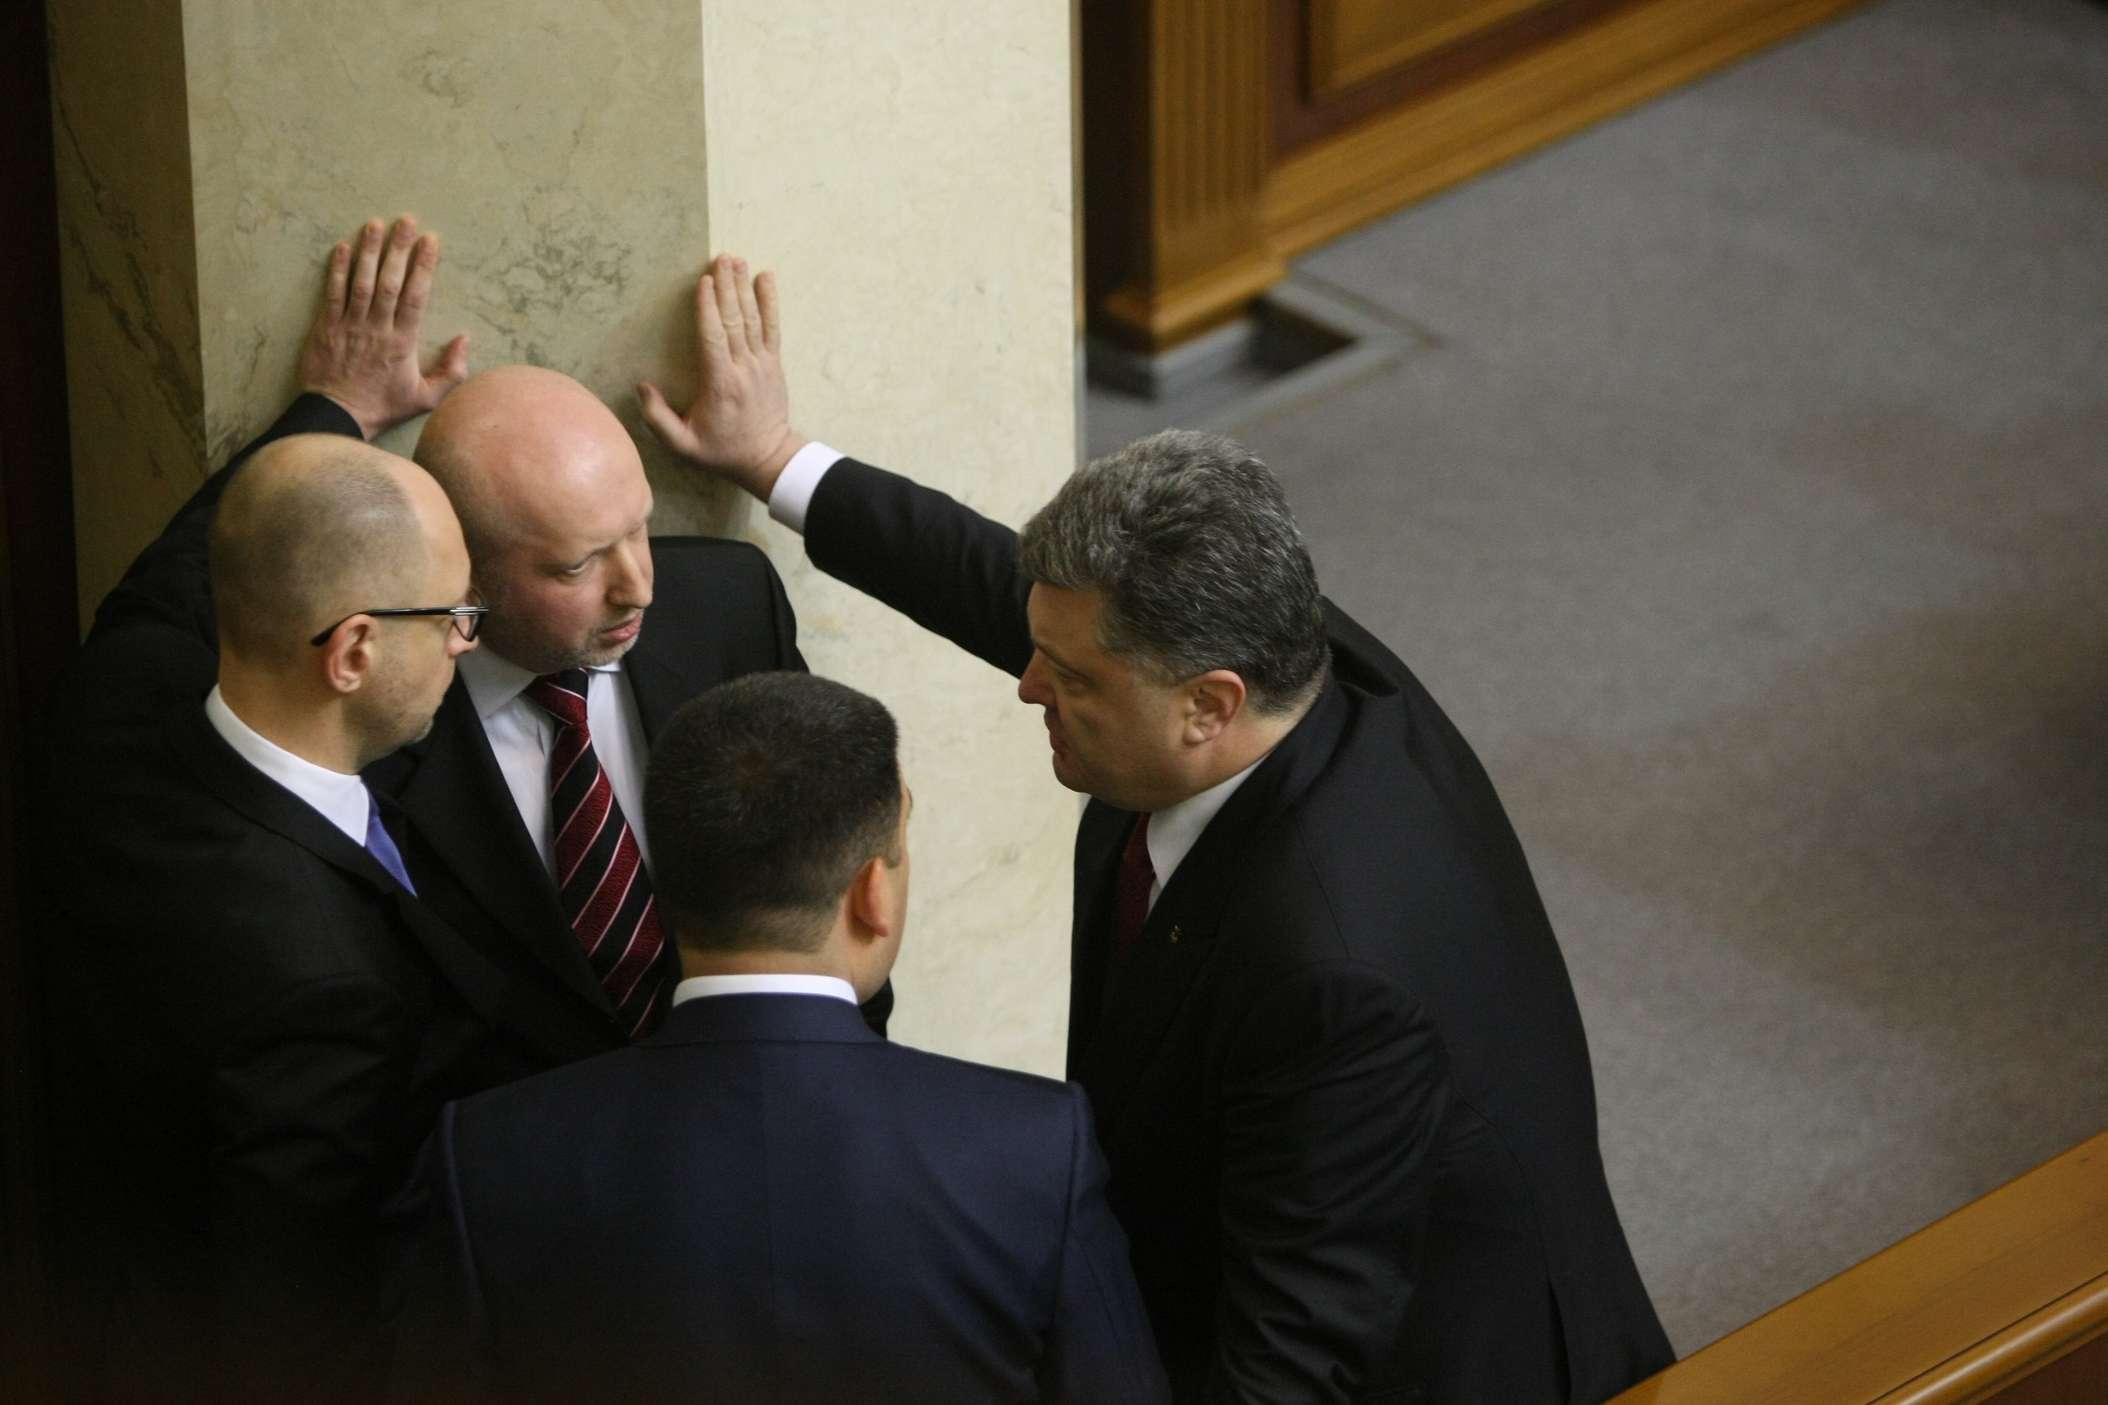 Генпрокуратура ДНР возбудила дело против Порошенко, Яценюка и Турчинова